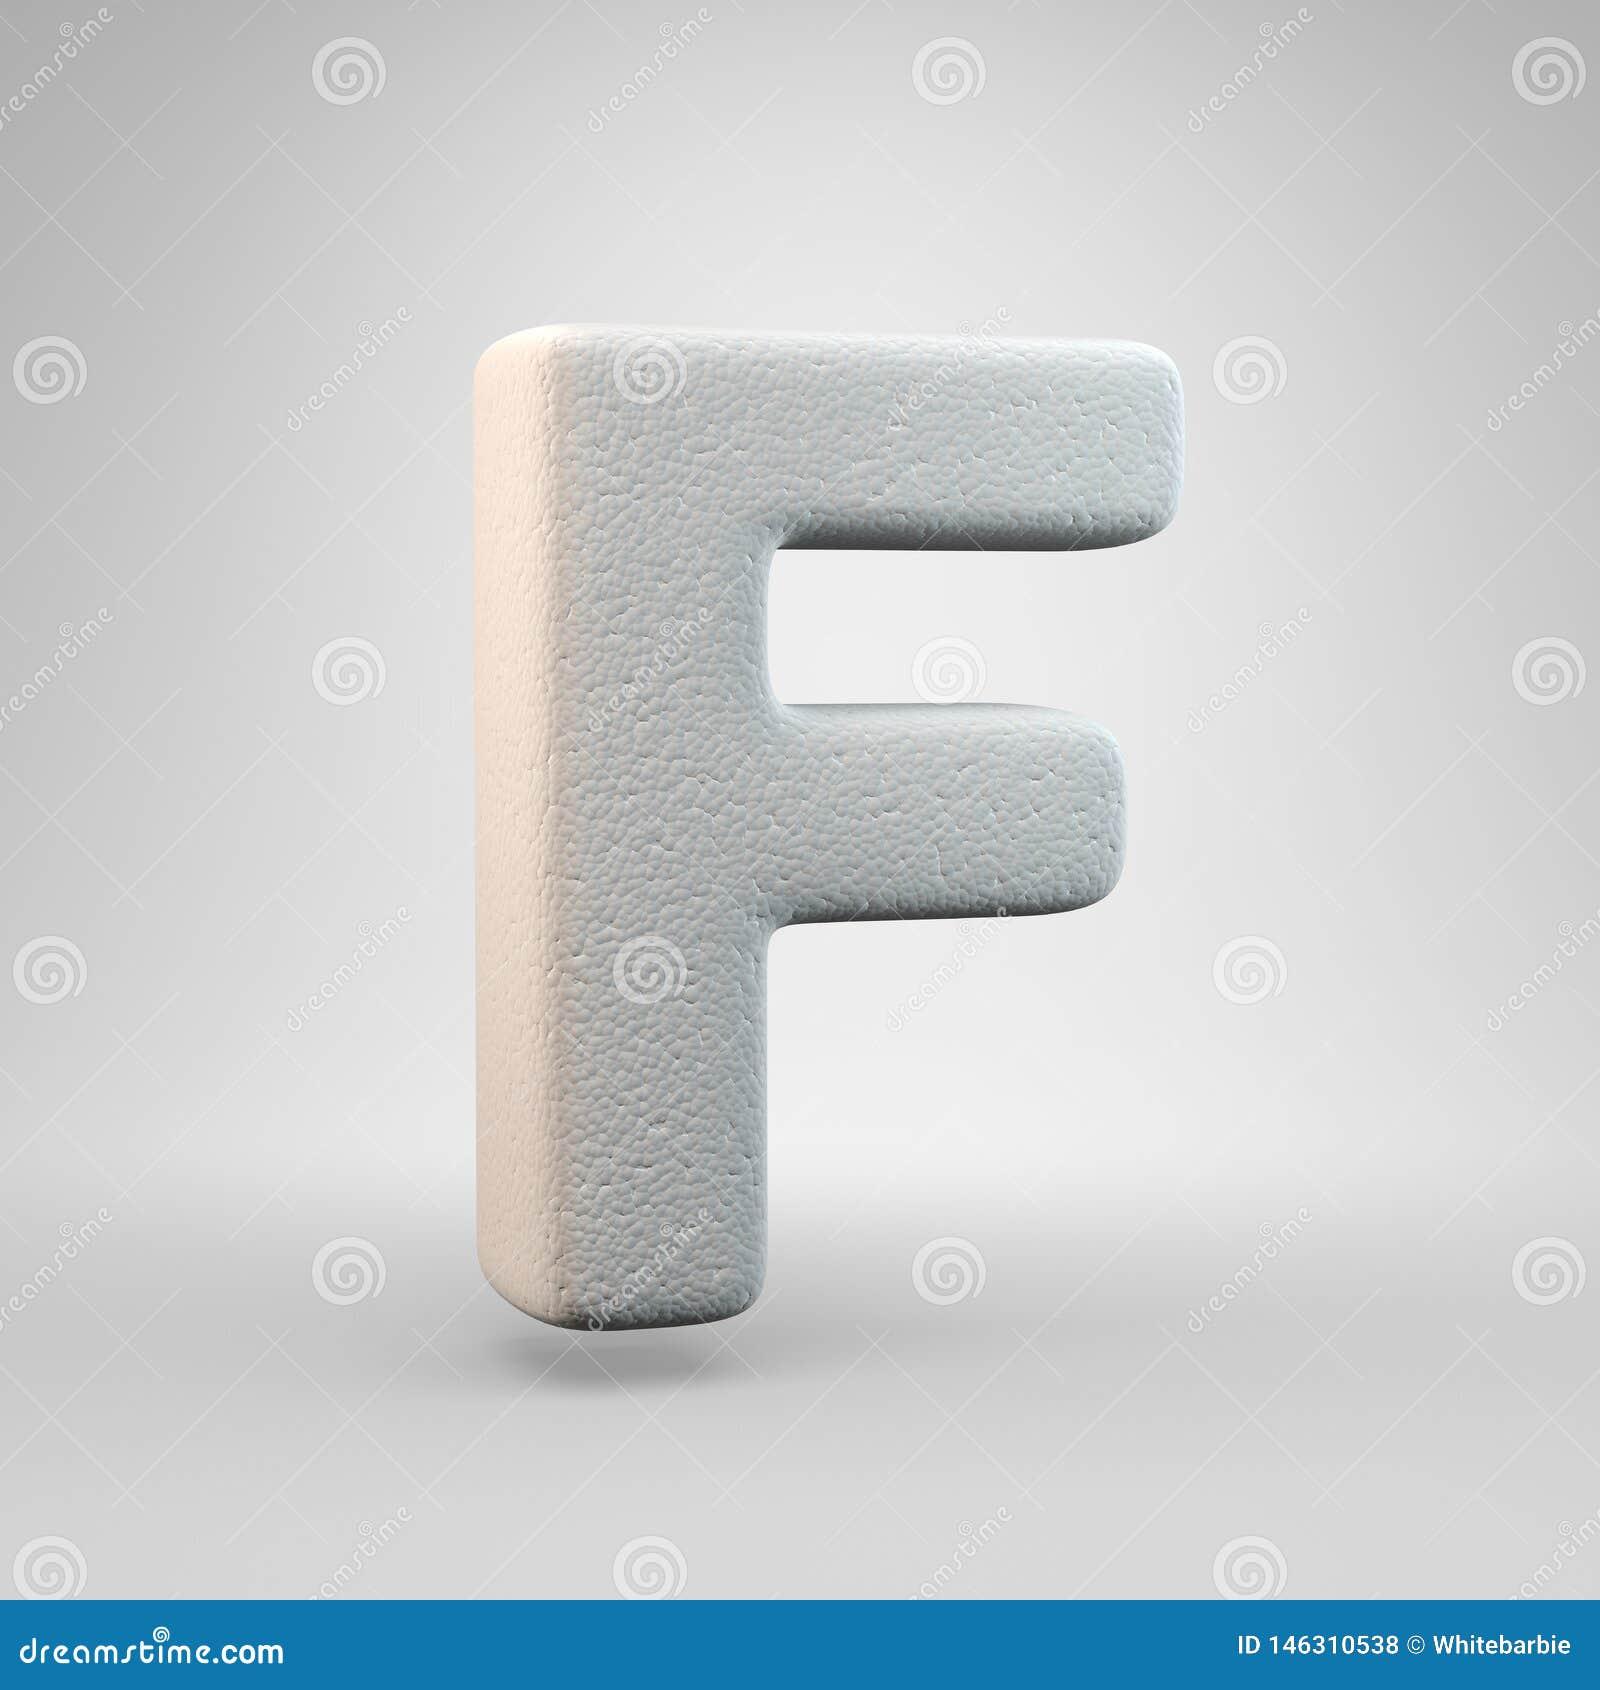 Volumetric construction foam uppercase letter F isolated on white background